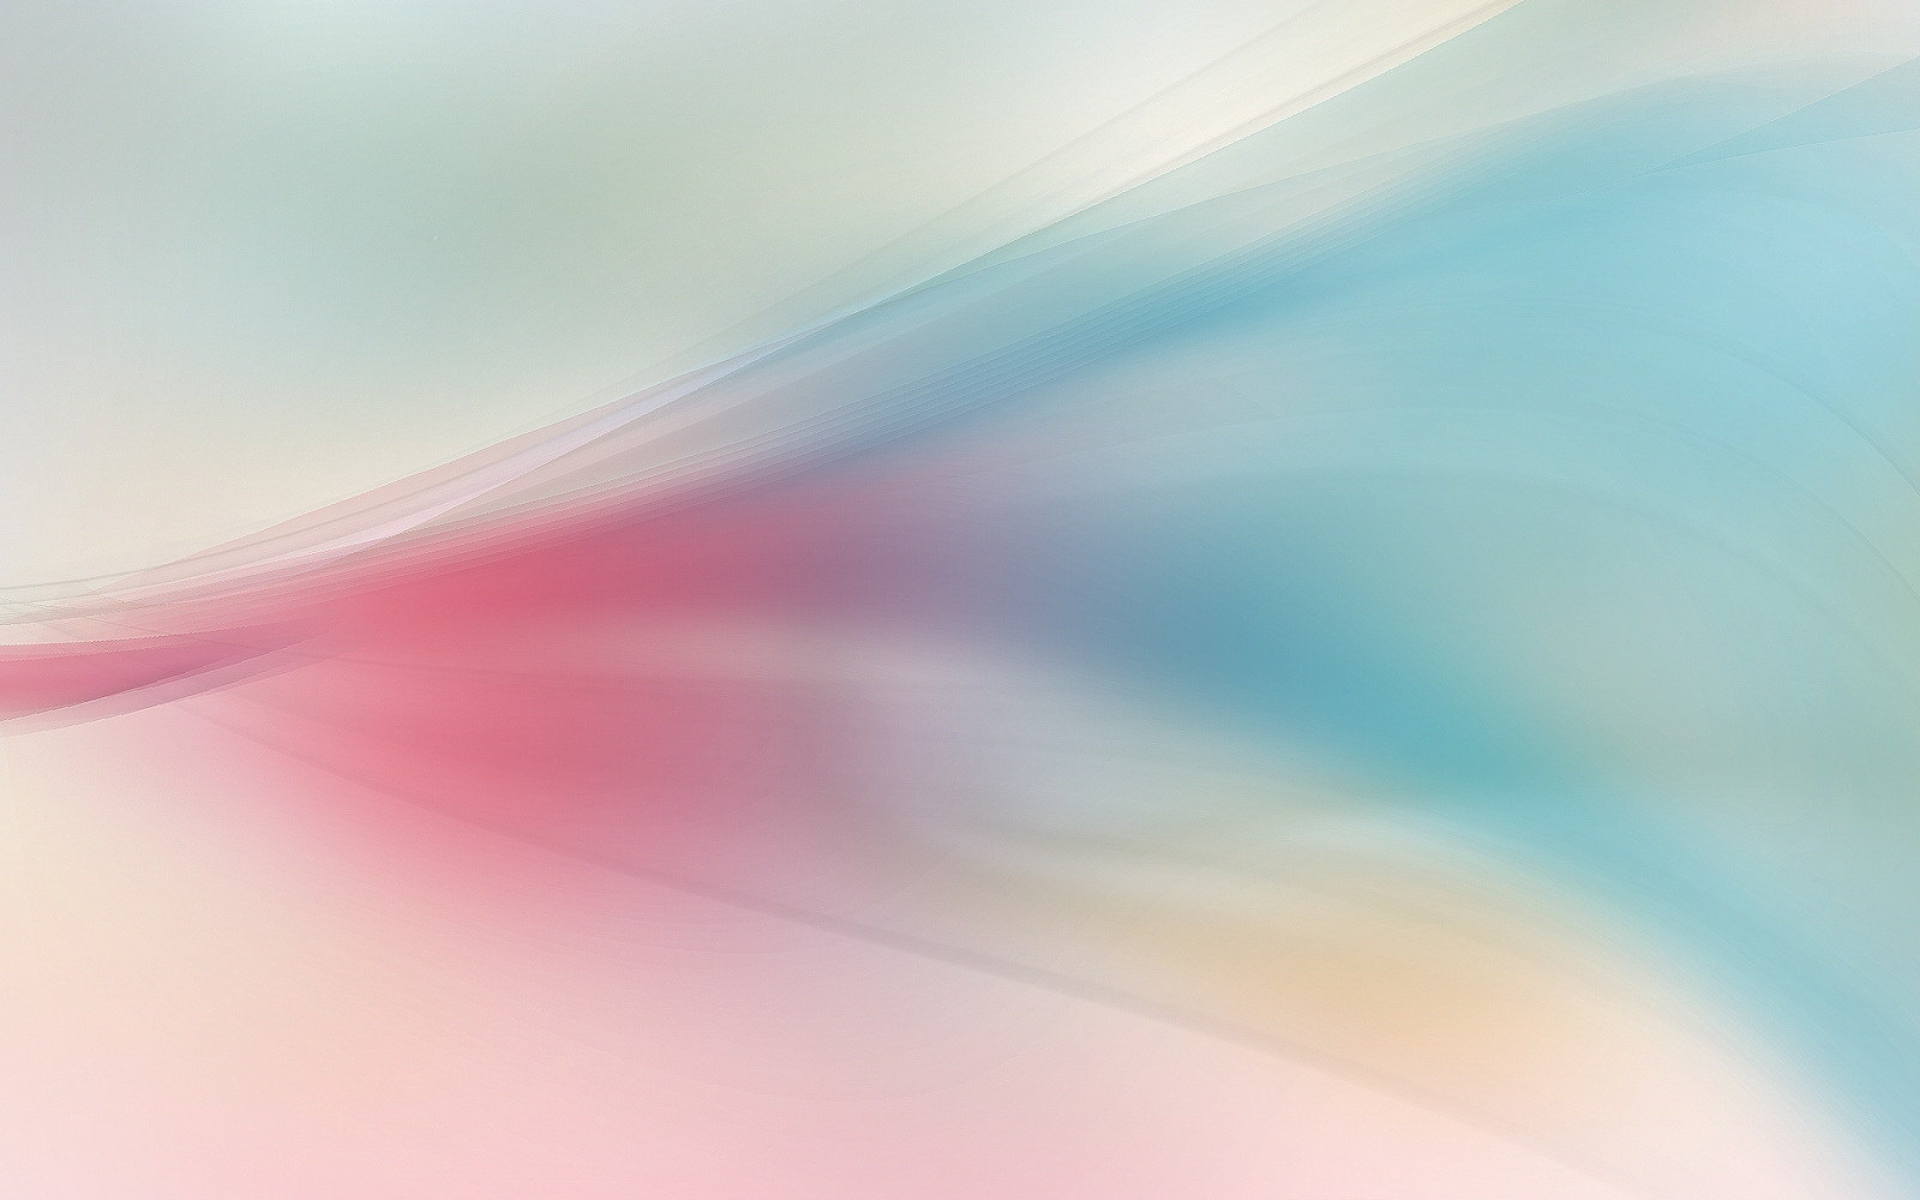 Картинки с переливом цвета